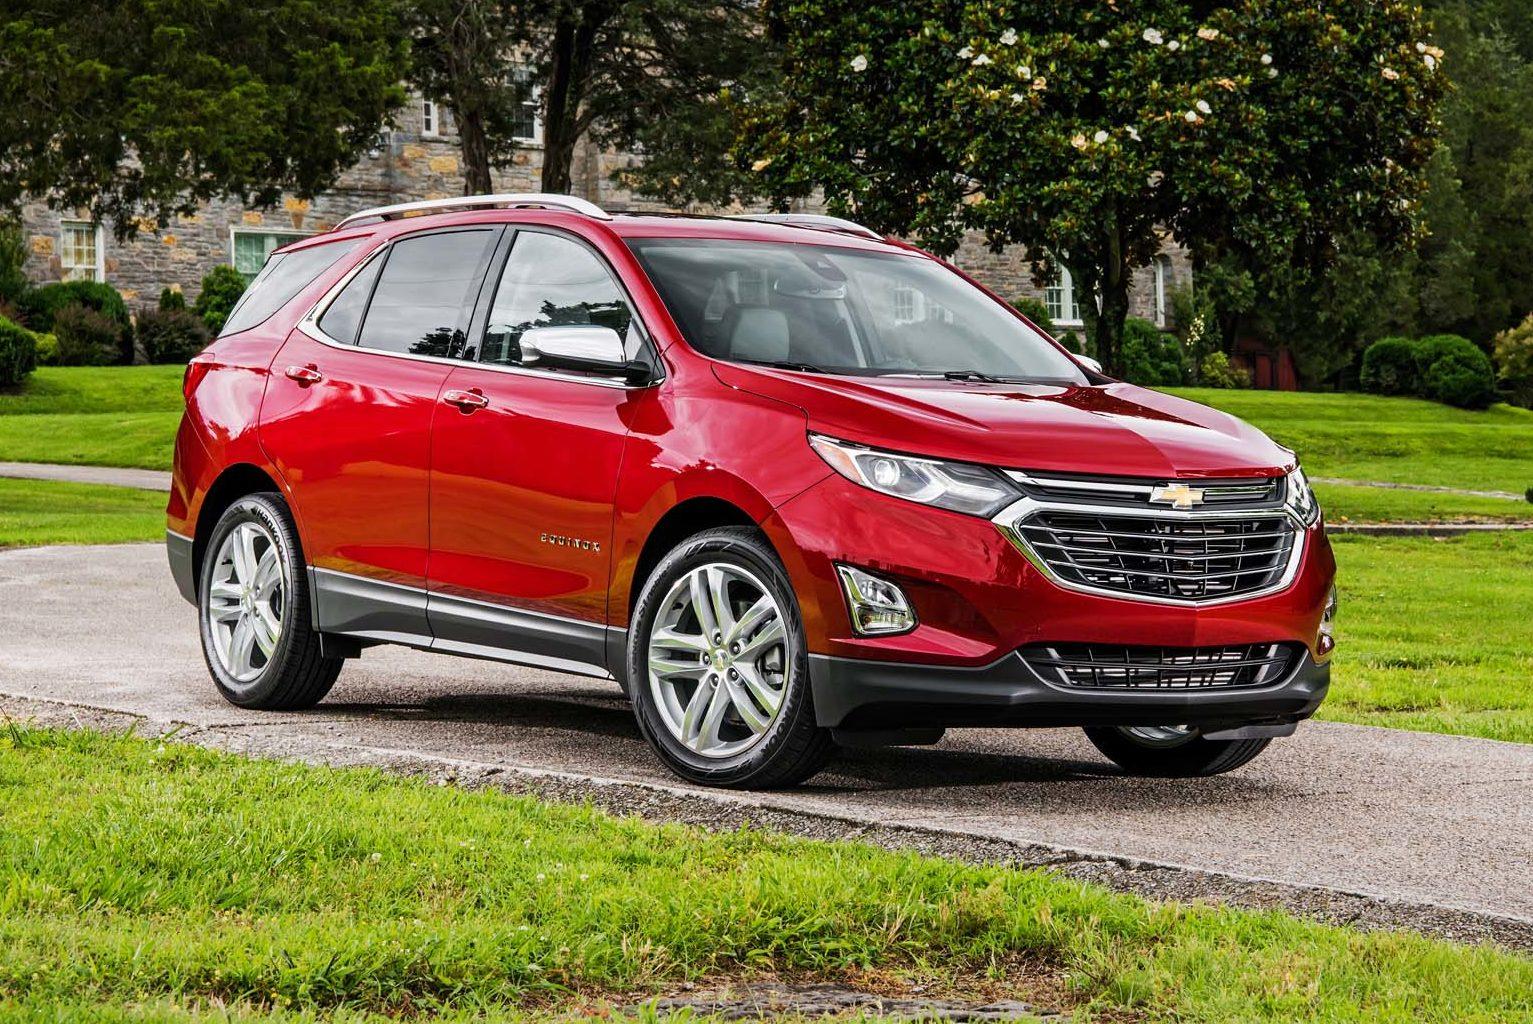 Equinox brown chevy equinox : Chevrolet Equinox Diesel Claims 577 Miles of Range | Automobile ...